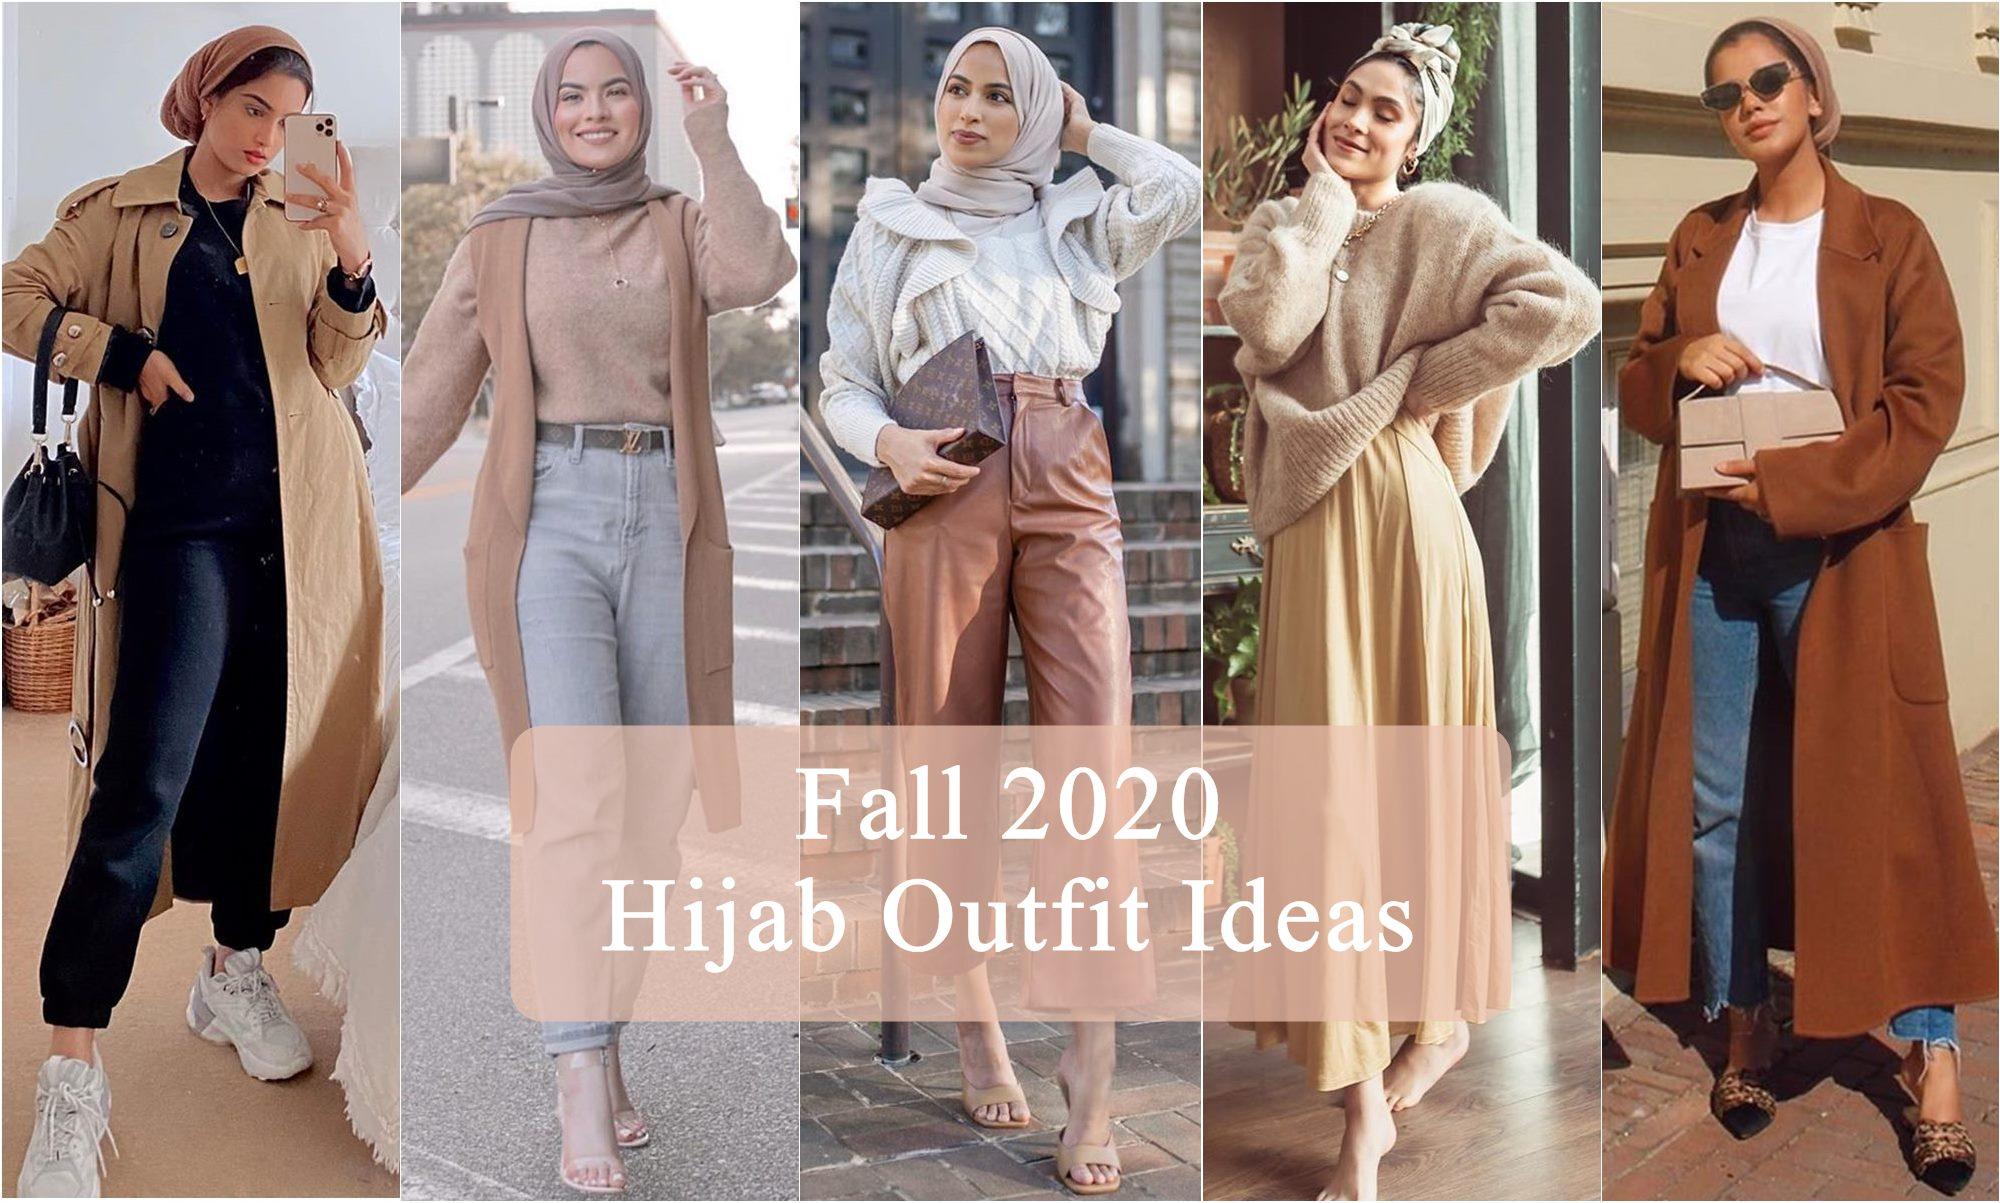 Fall 20 Hijab Outfit Ideas   Hijab Fashion Inspiration